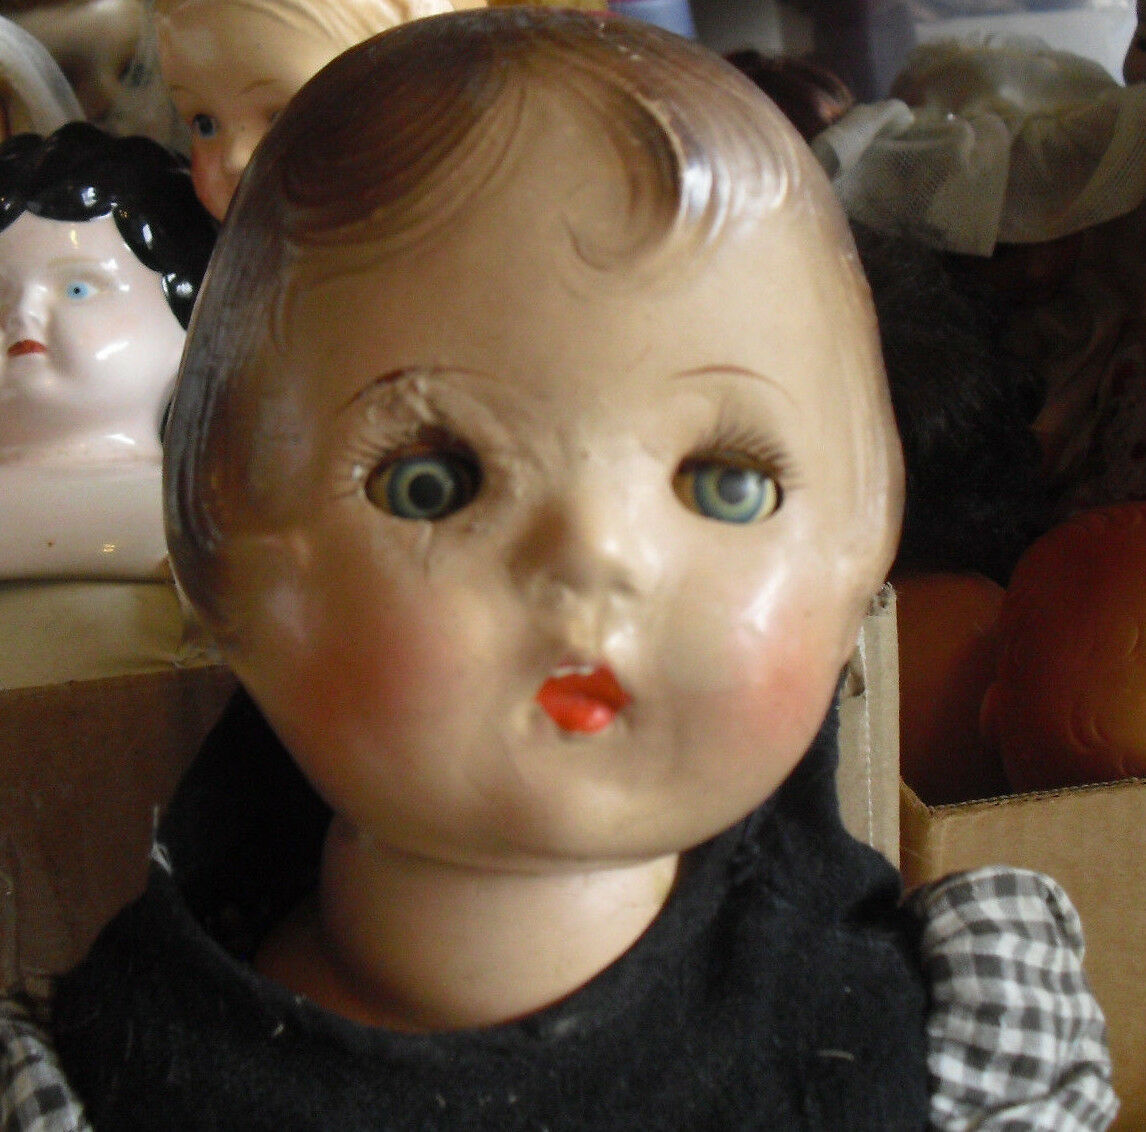 Vintage 1920s Acme Toy Composition Girl Doll Tin Sleepy Sleepy Sleepy Eyes 17